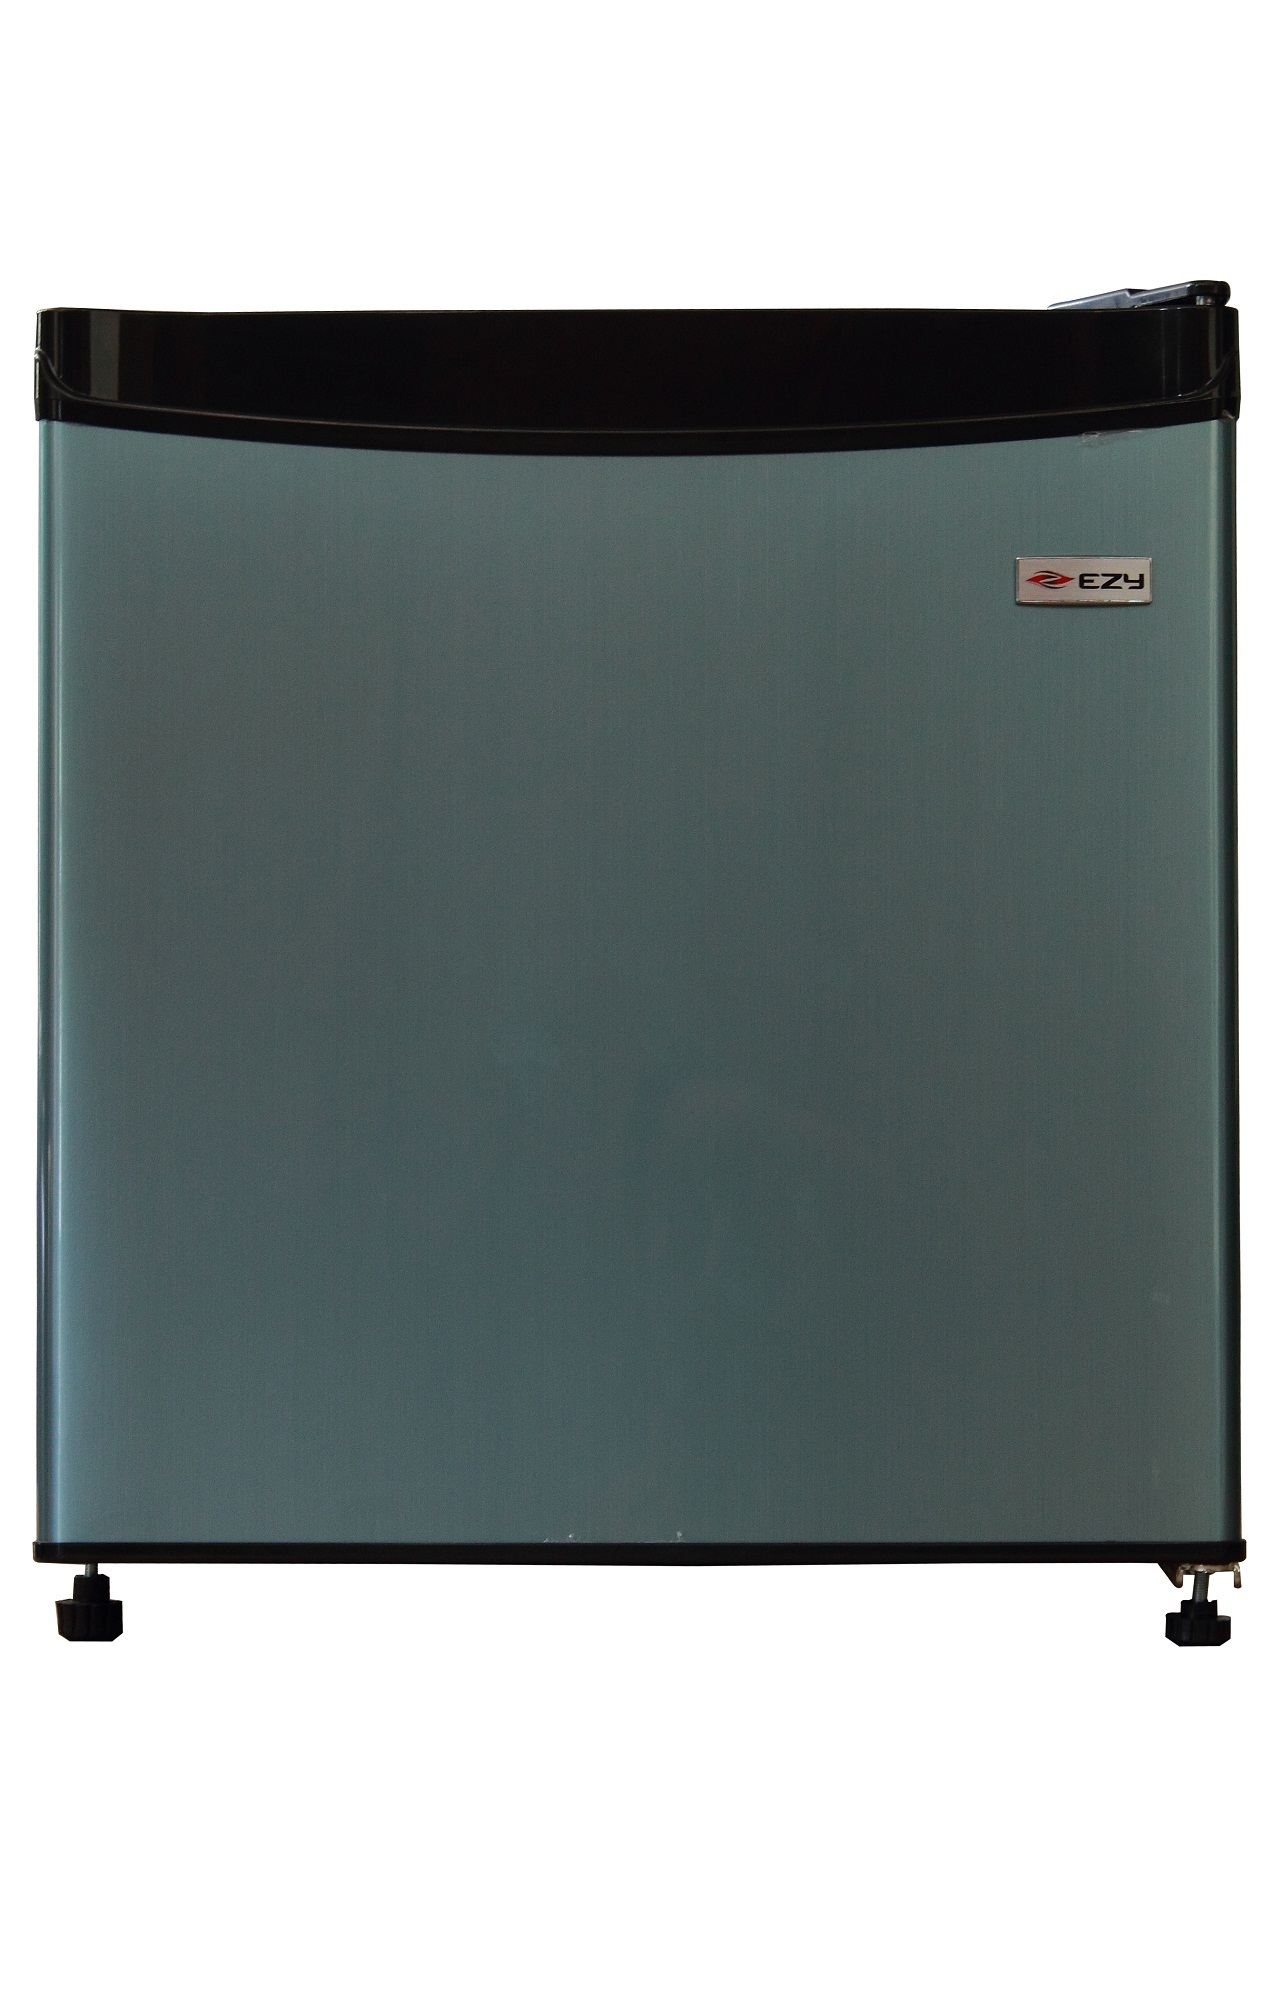 refrigerator prices. refrigerator (blue) prices